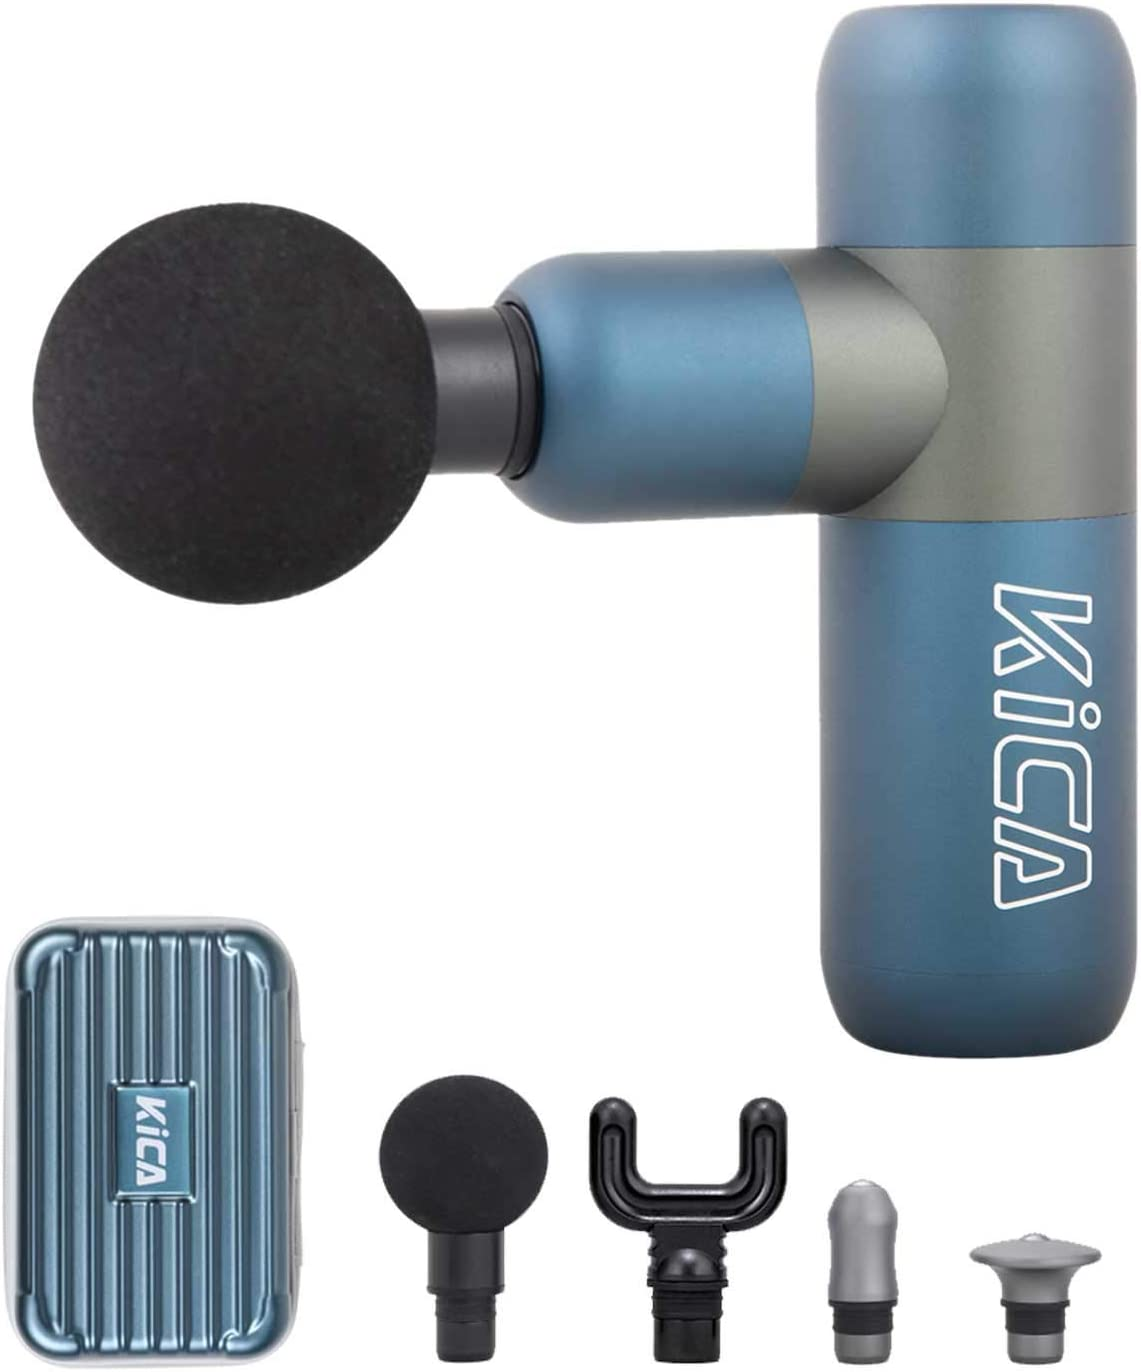 KICAK2 Pistola de masaje Masajeador muscular de percusión de tejido profundo Masajeador eléctrico de mano para aliviar Atleta muscular 4 cabezales de masaje con estuche de transporte